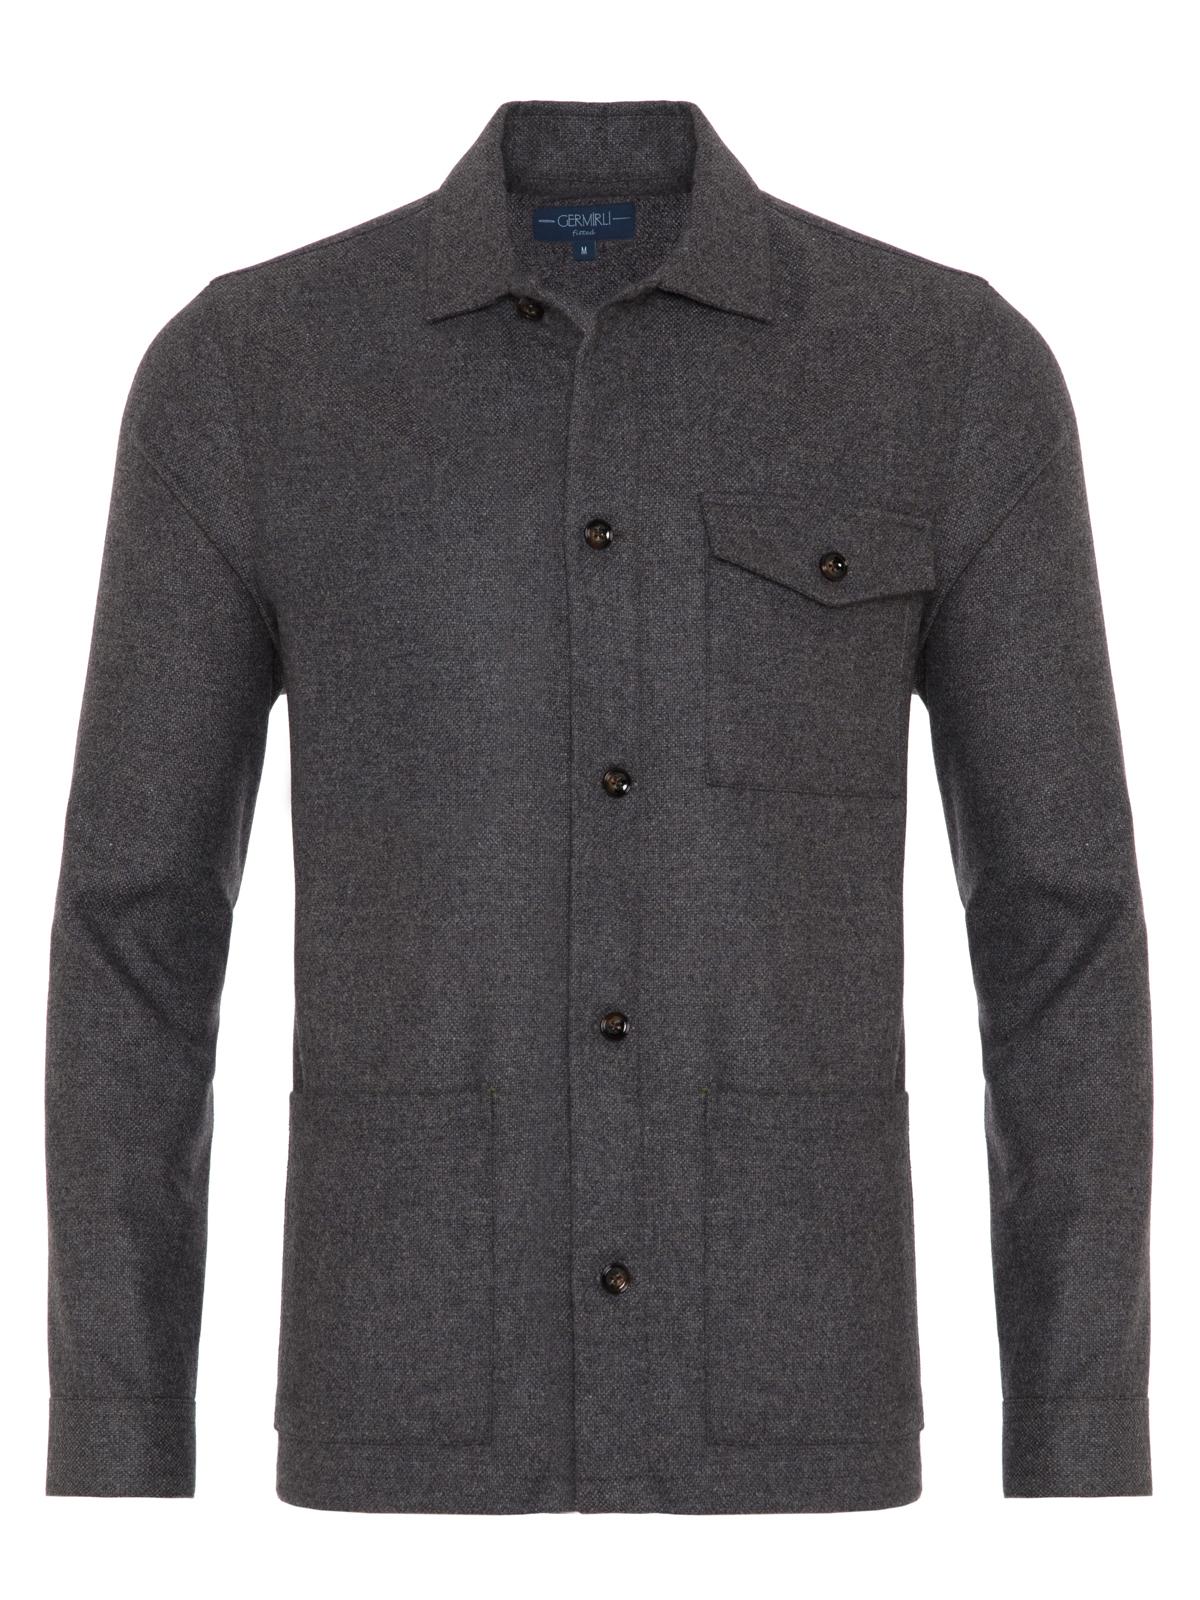 Germirli Gri %100 Yün Tailor Fit Wool Heritage Ceket Gömlek